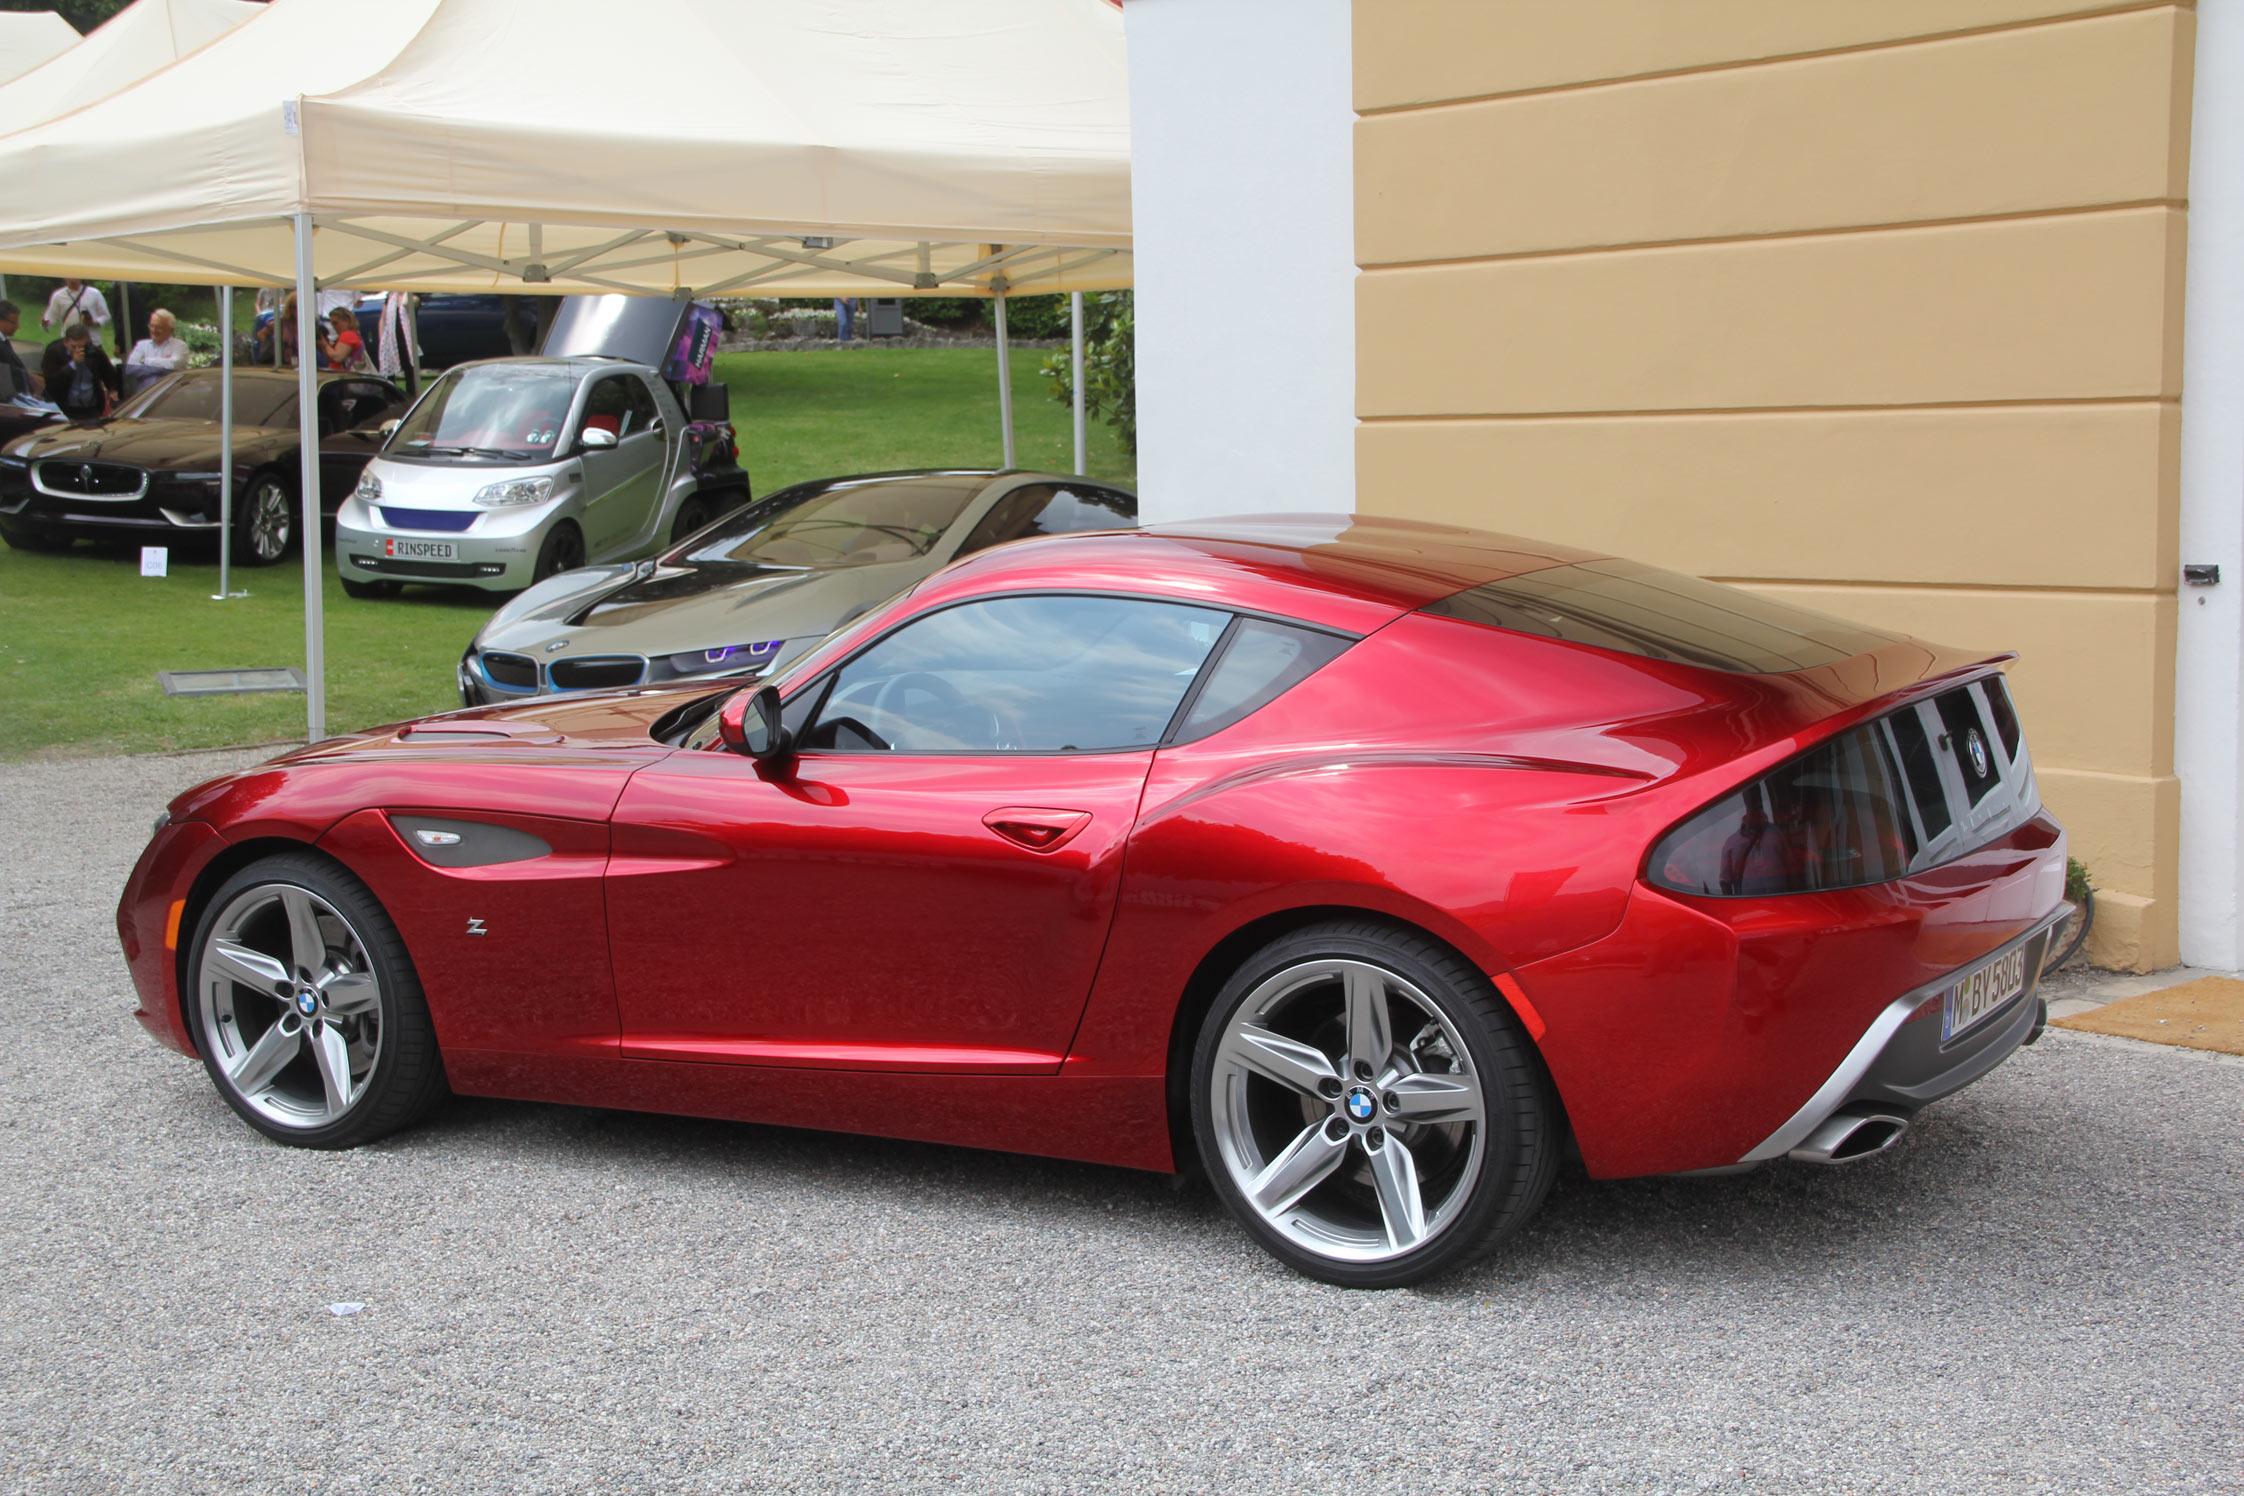 2012 Bmw Zagato Coupe Concept (49 Images) - New HD Car Wallpaper